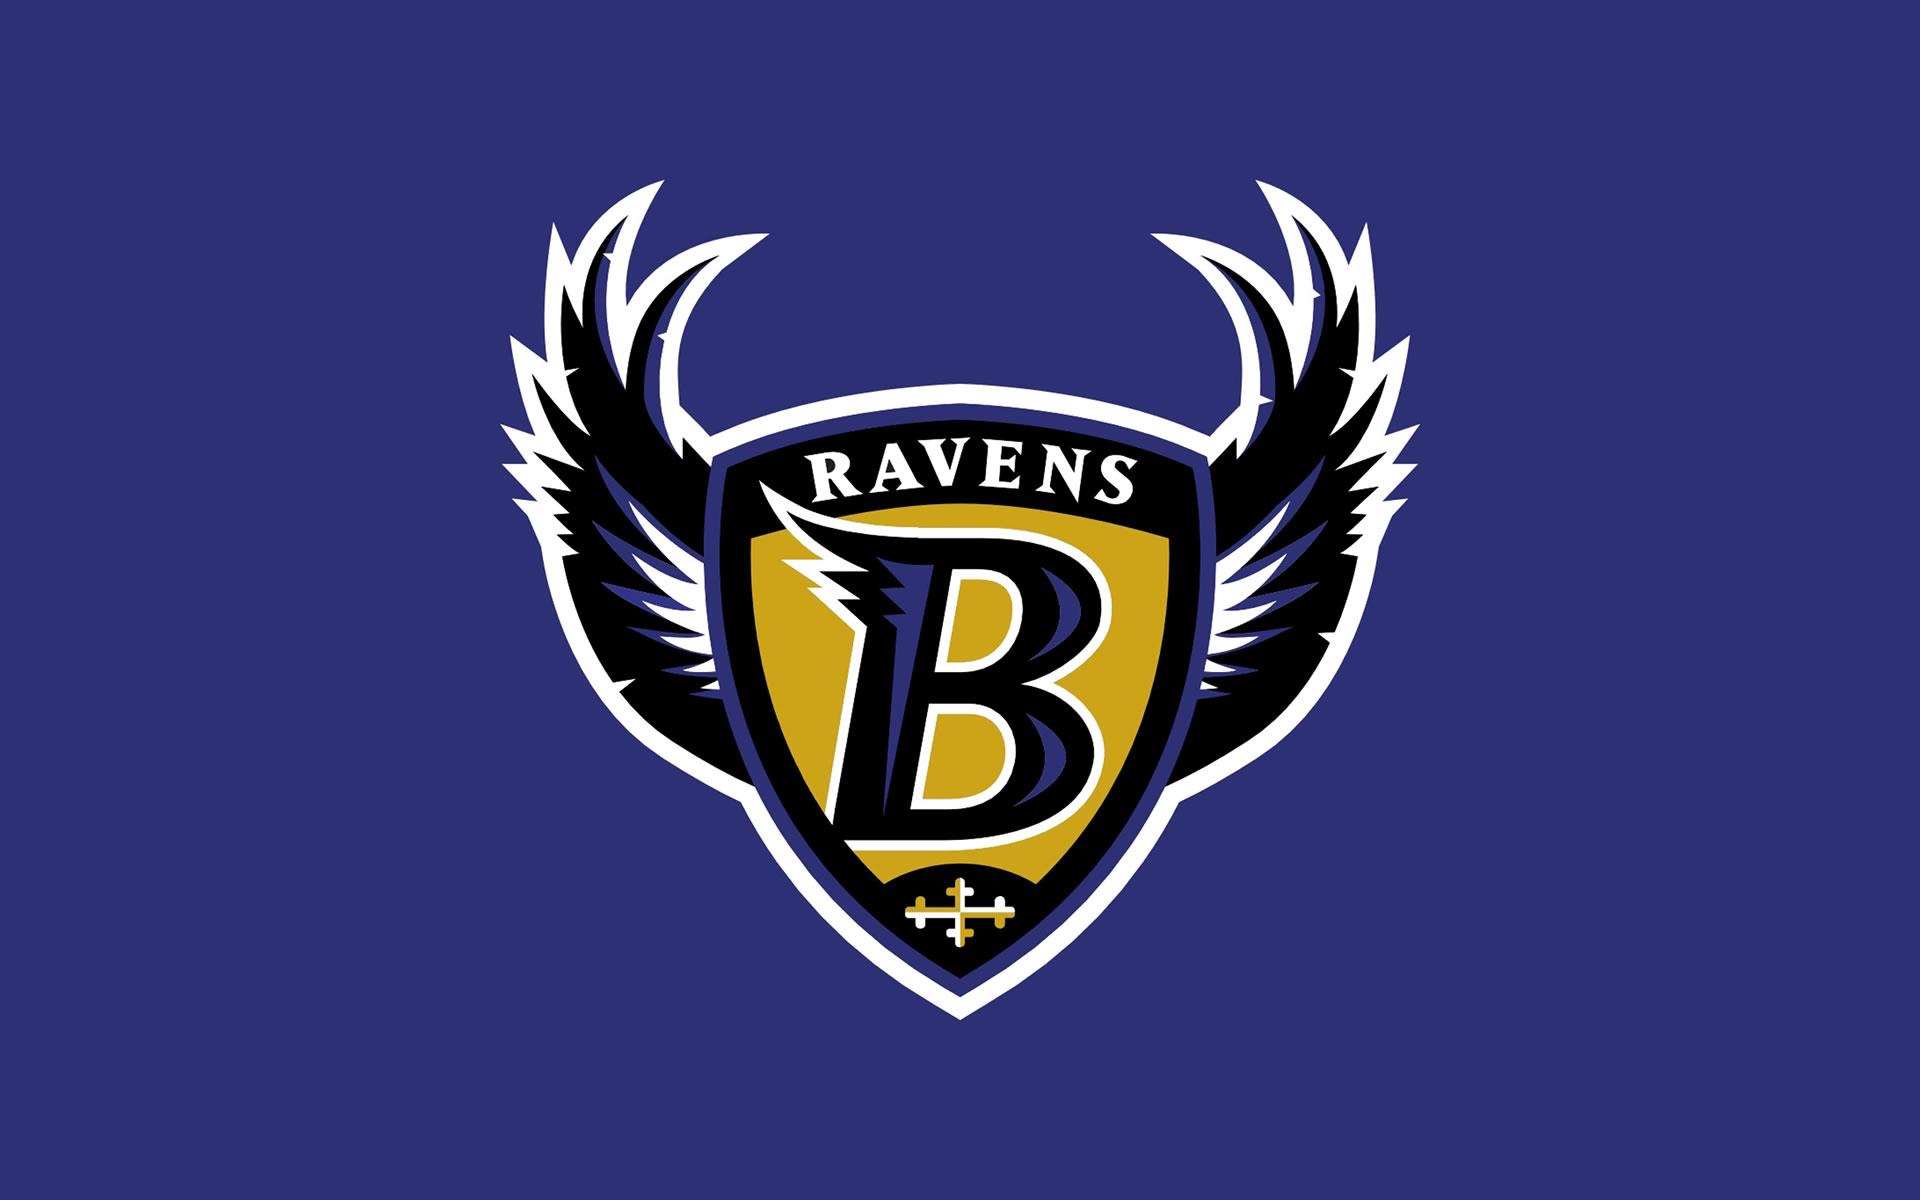 Super Bowl 2013. Ravens Baltimore